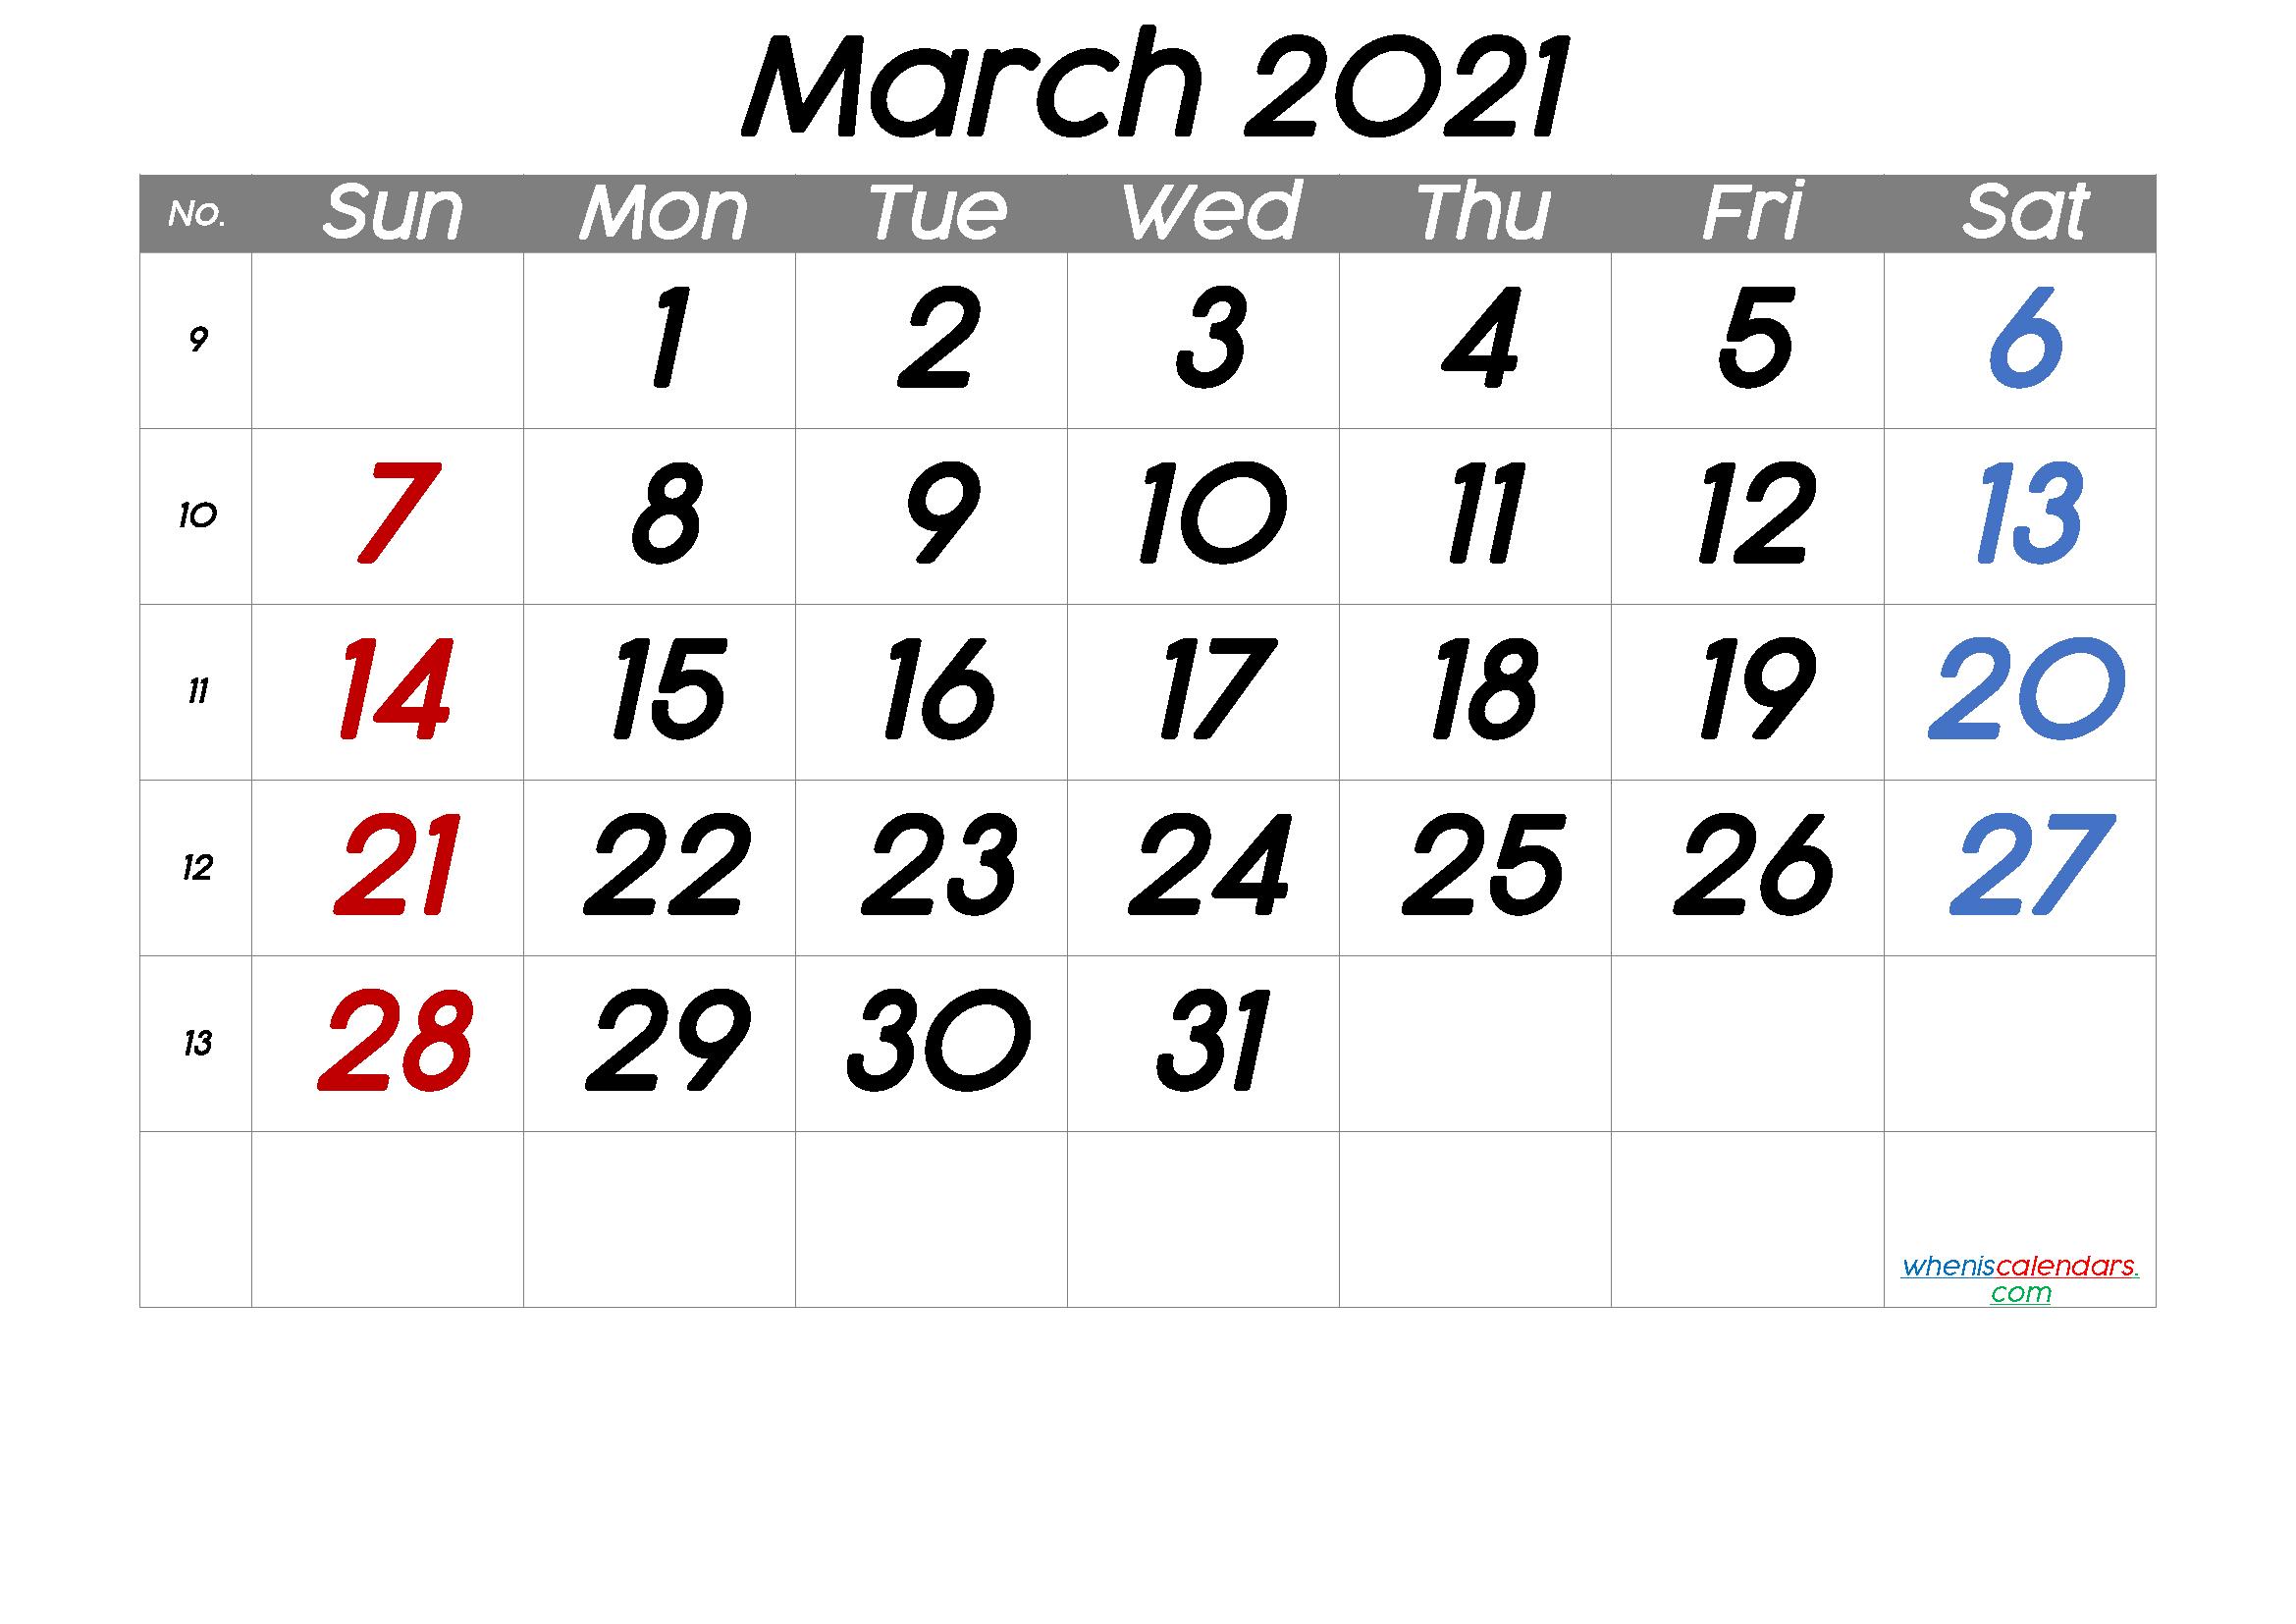 March 2021 Printable Calendar With Week Numbers 6